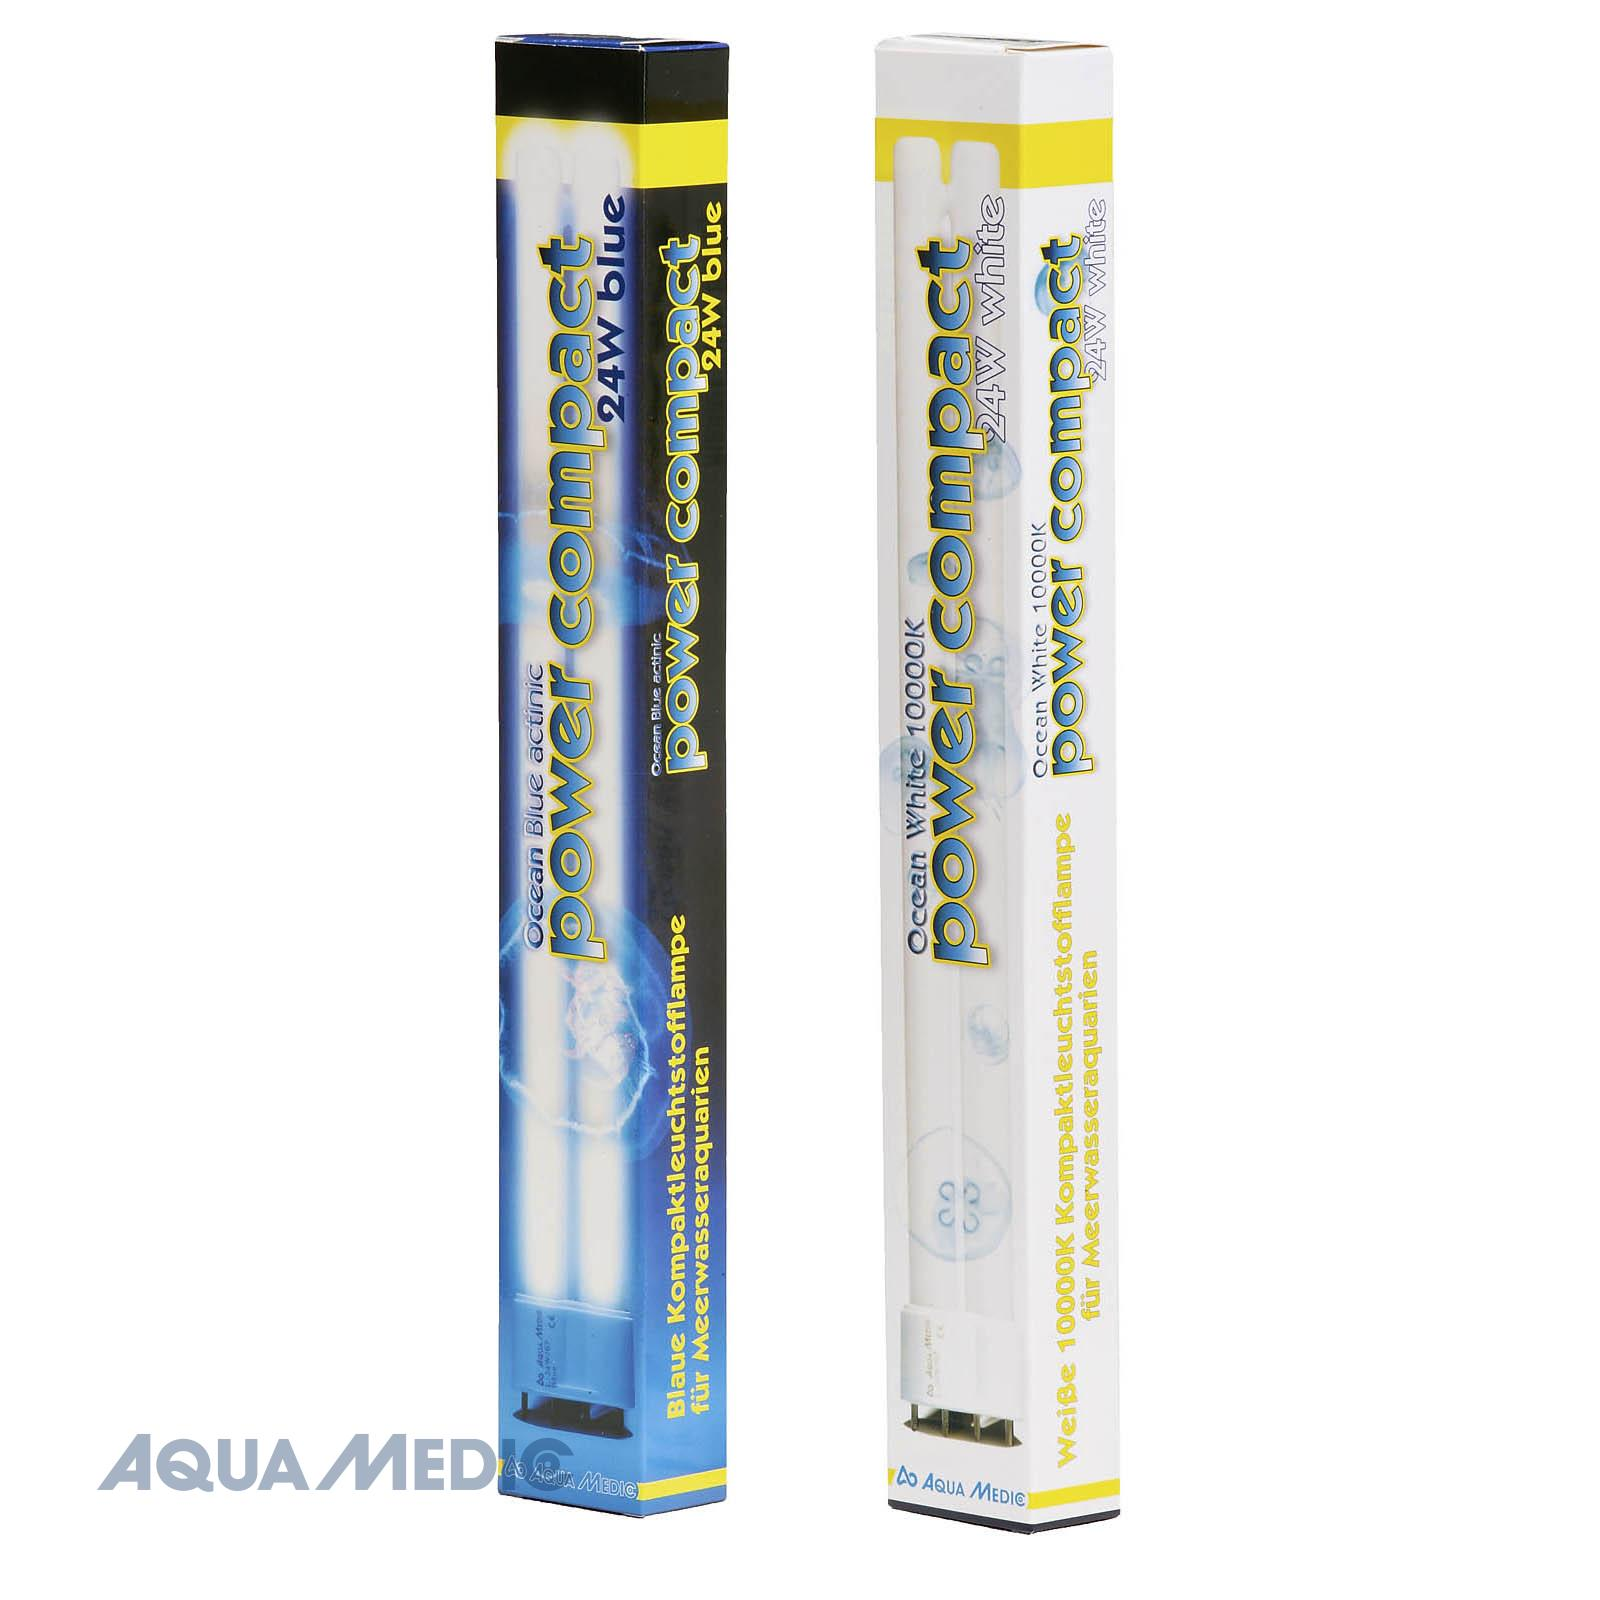 Ocean White Power Compact 24 W - Blauweiße Kompaktleuchtstofflampe